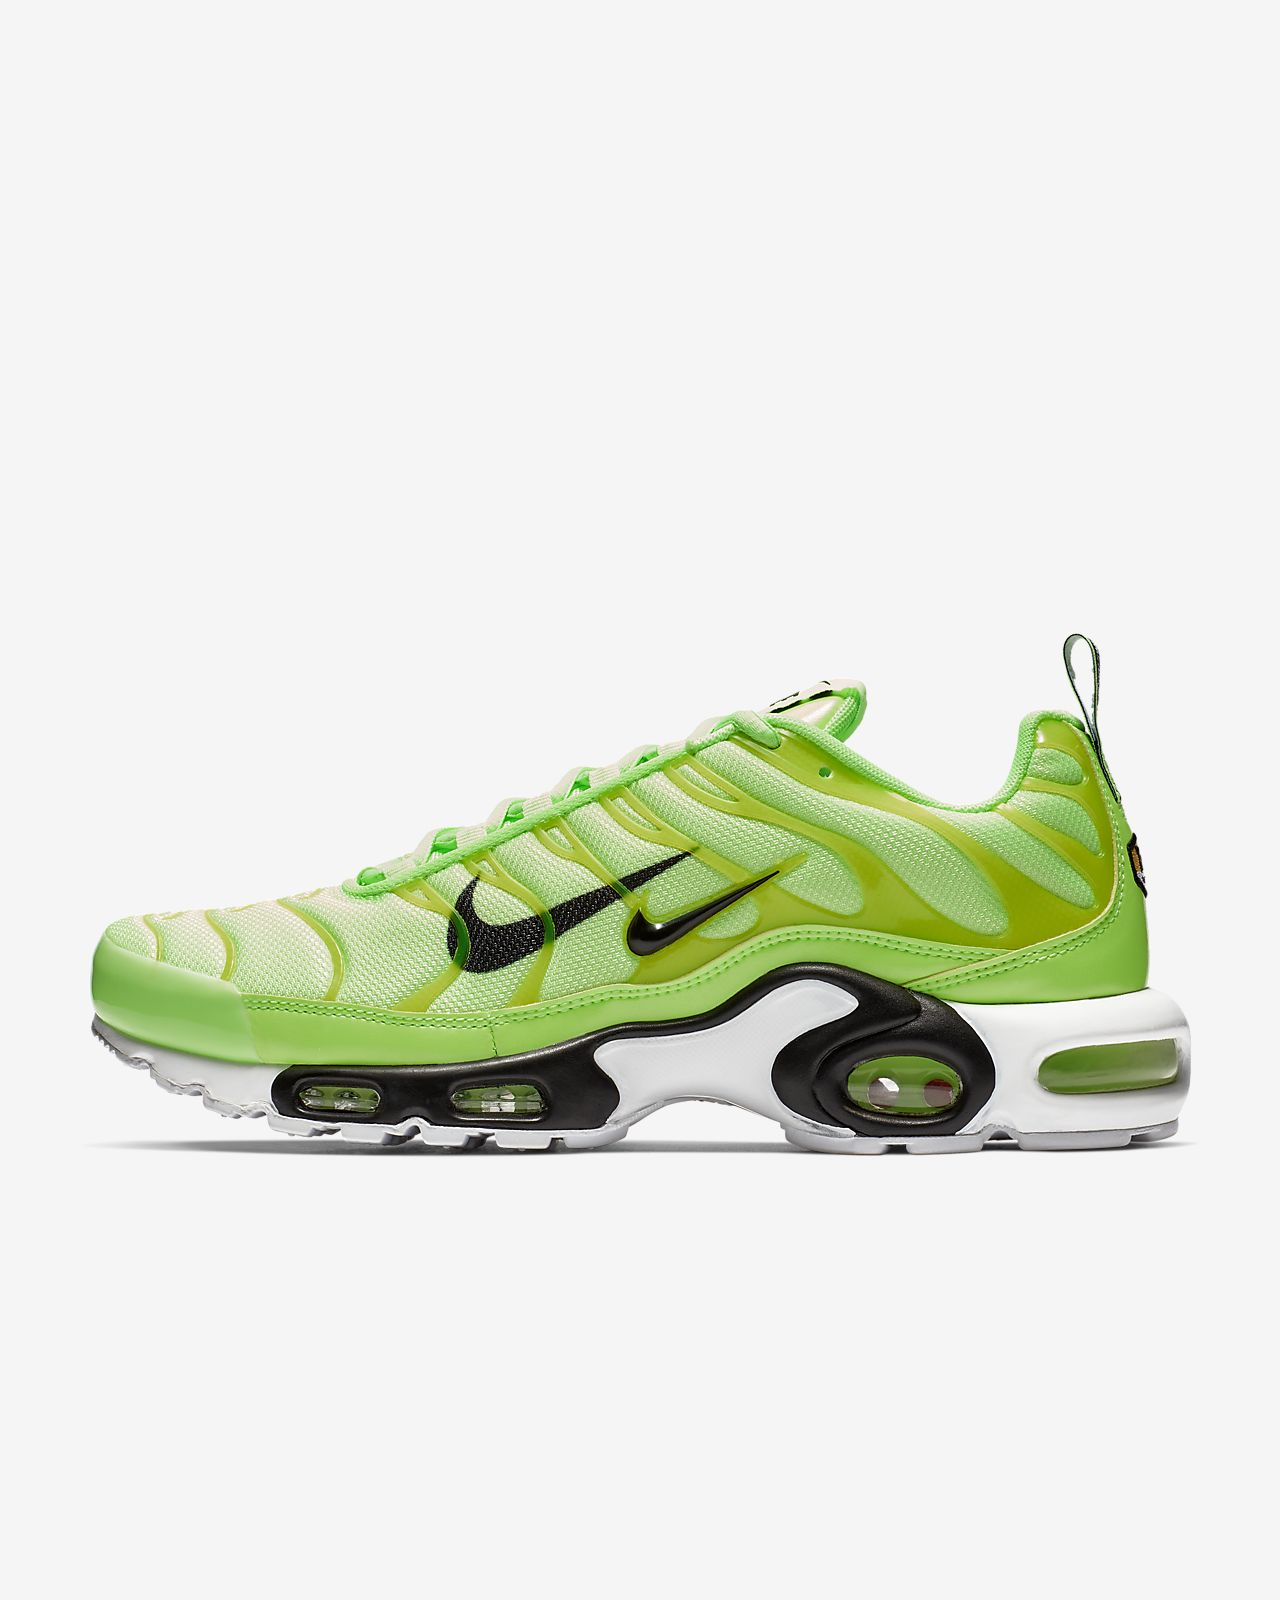 Air Pour Chaussure Max Premium Nike HommeBe Plus WDI2EHeY9